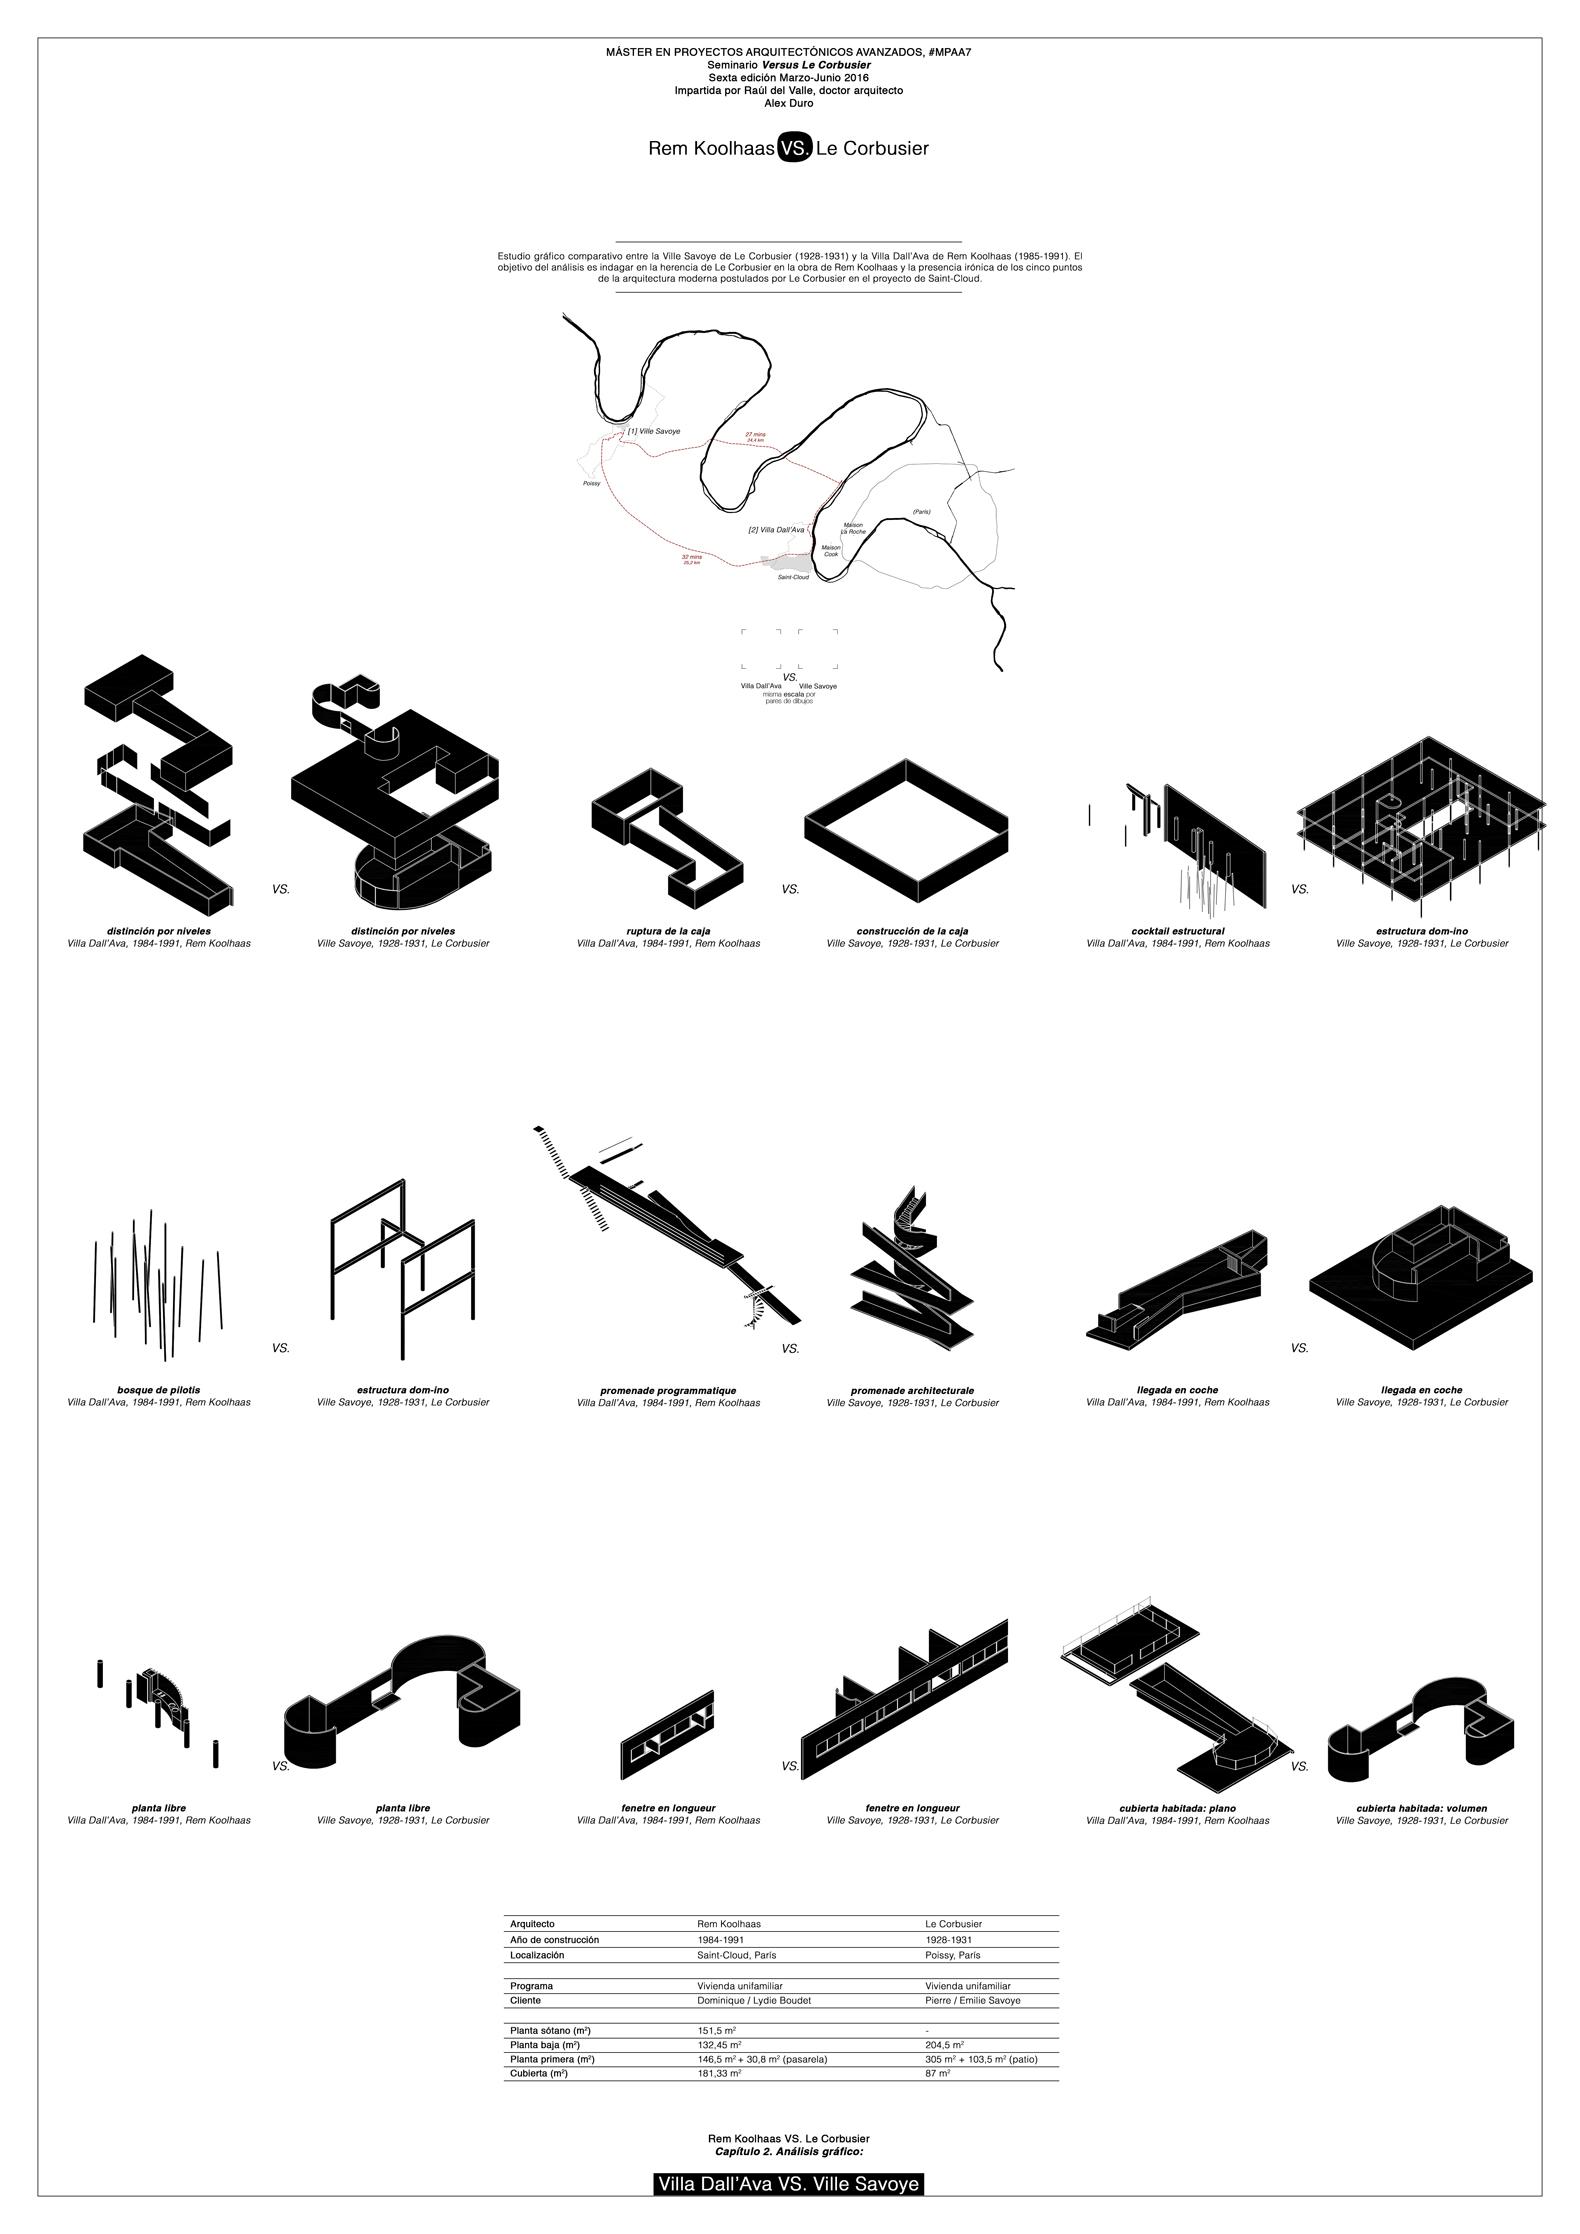 Le Corbusier Les 5 Points villa savoye and villa dall'ava | the strength of